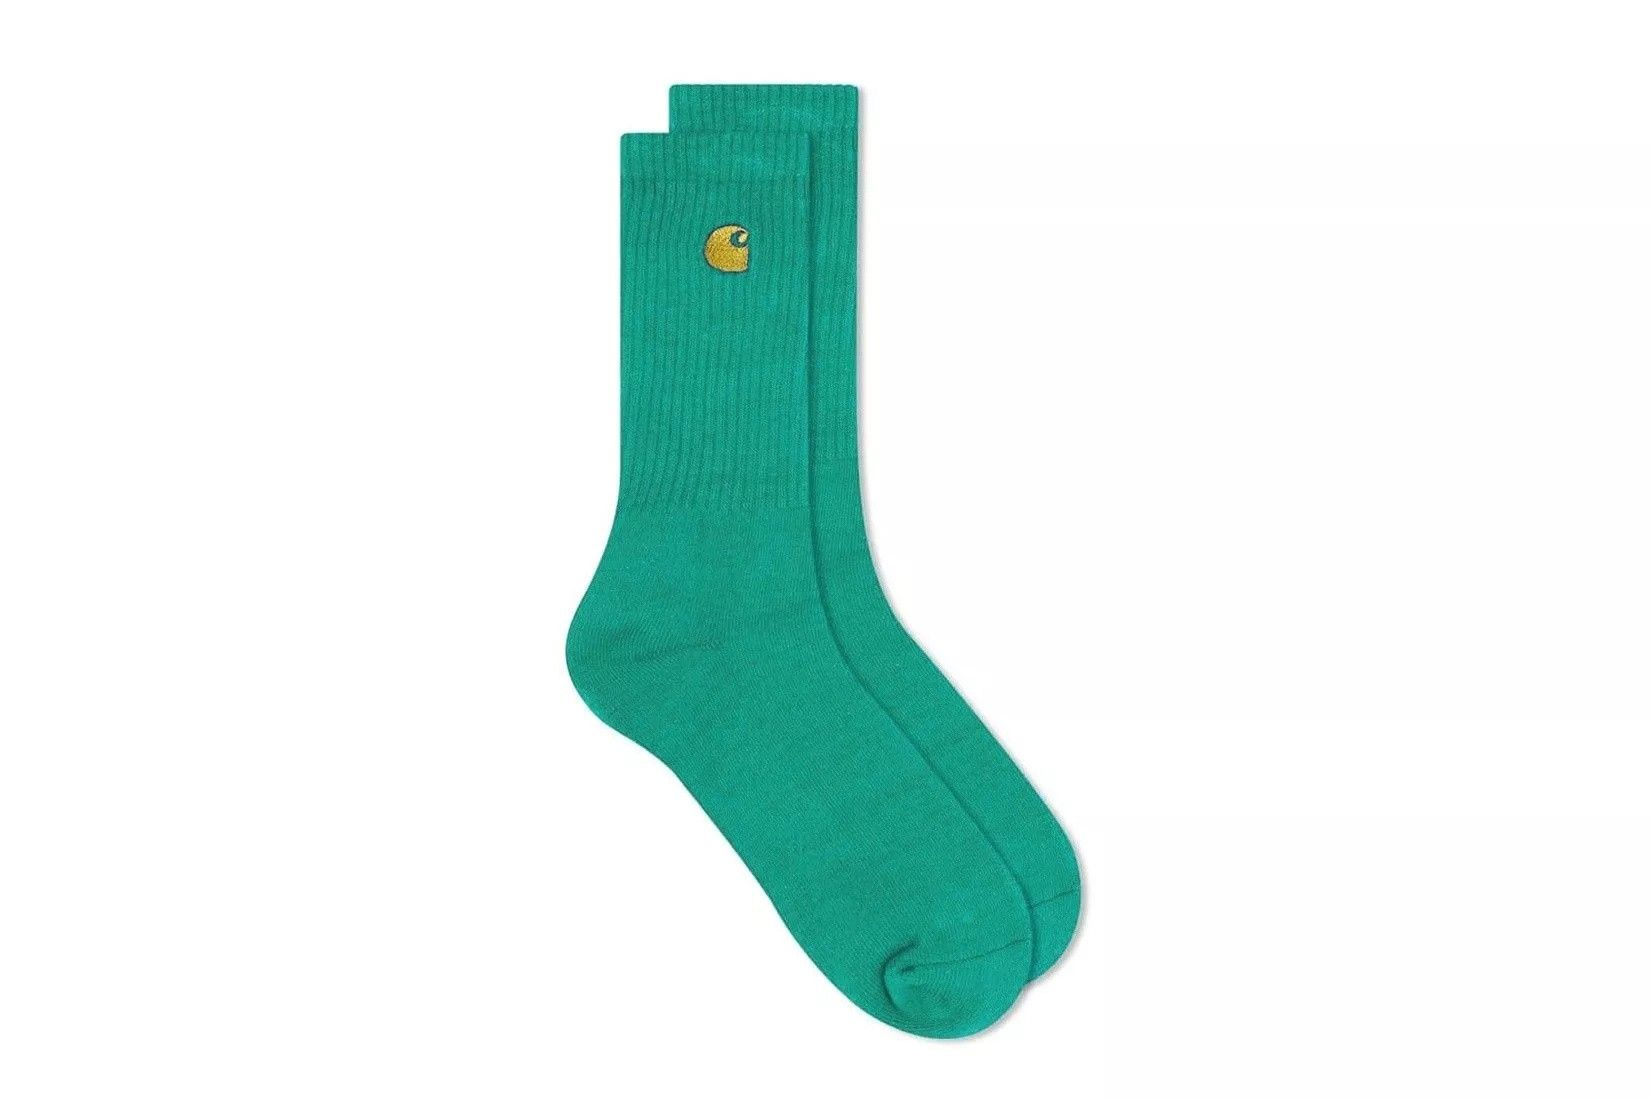 Afbeelding van Carhartt WIP Chase Socks I026527 Sokken Yoda / Gold